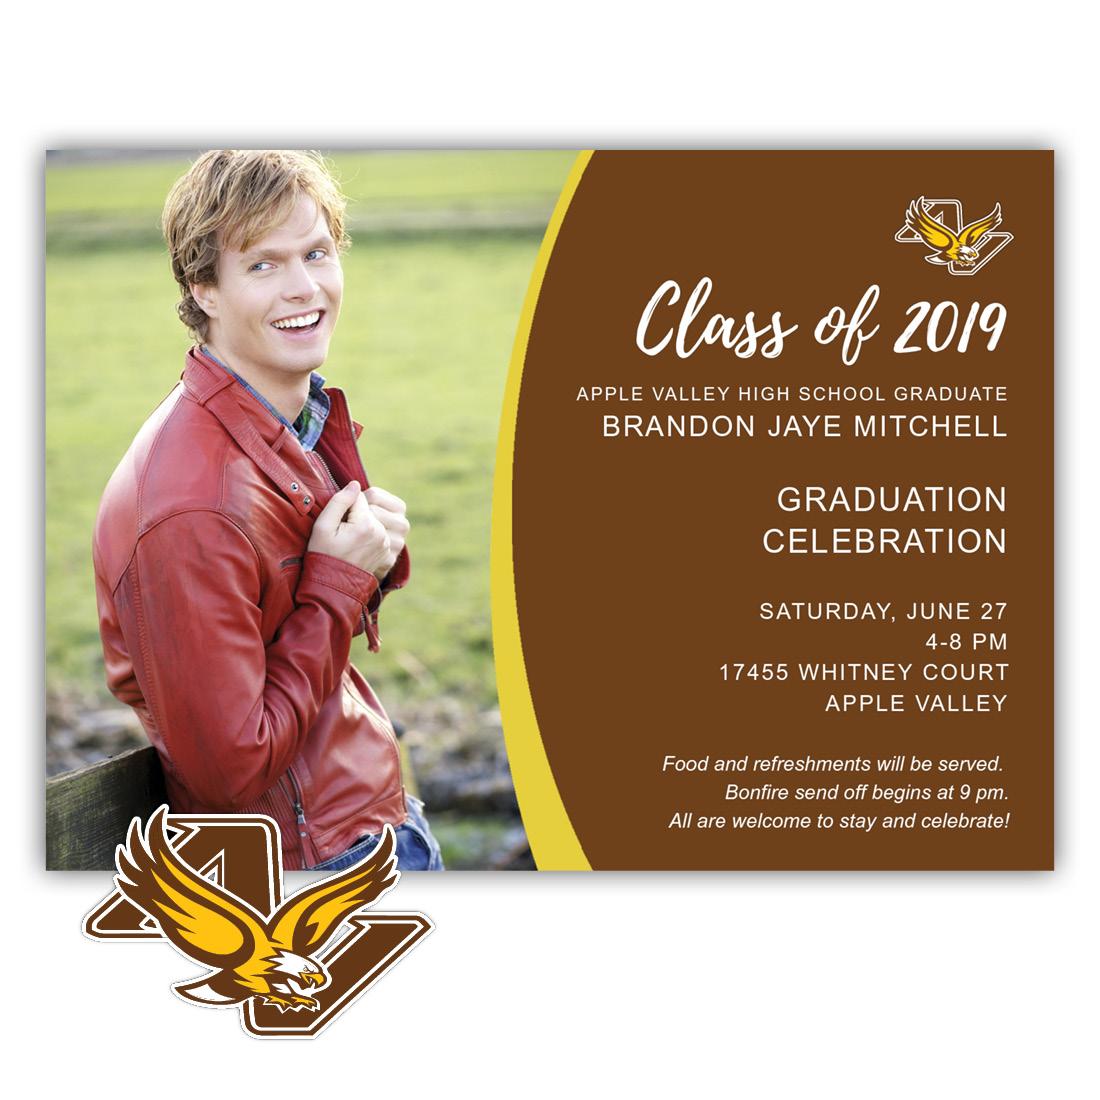 School Spirit, Apple Valley High School - Focus in Pix Graduation Party Invitation or Announcement